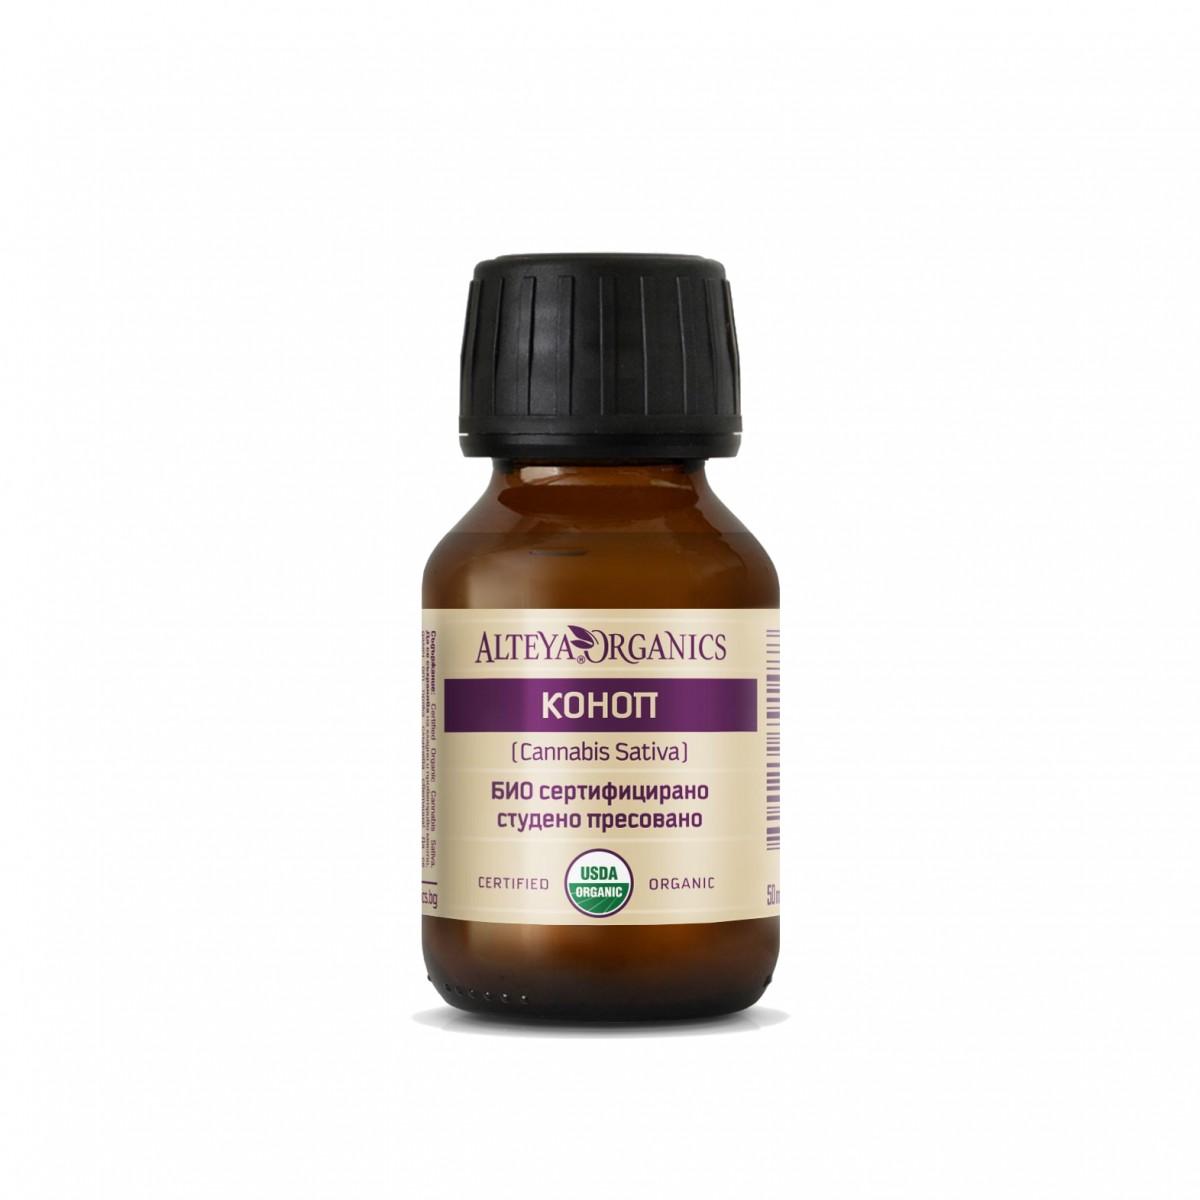 Bio organic hemp seed oil Alteya Organics